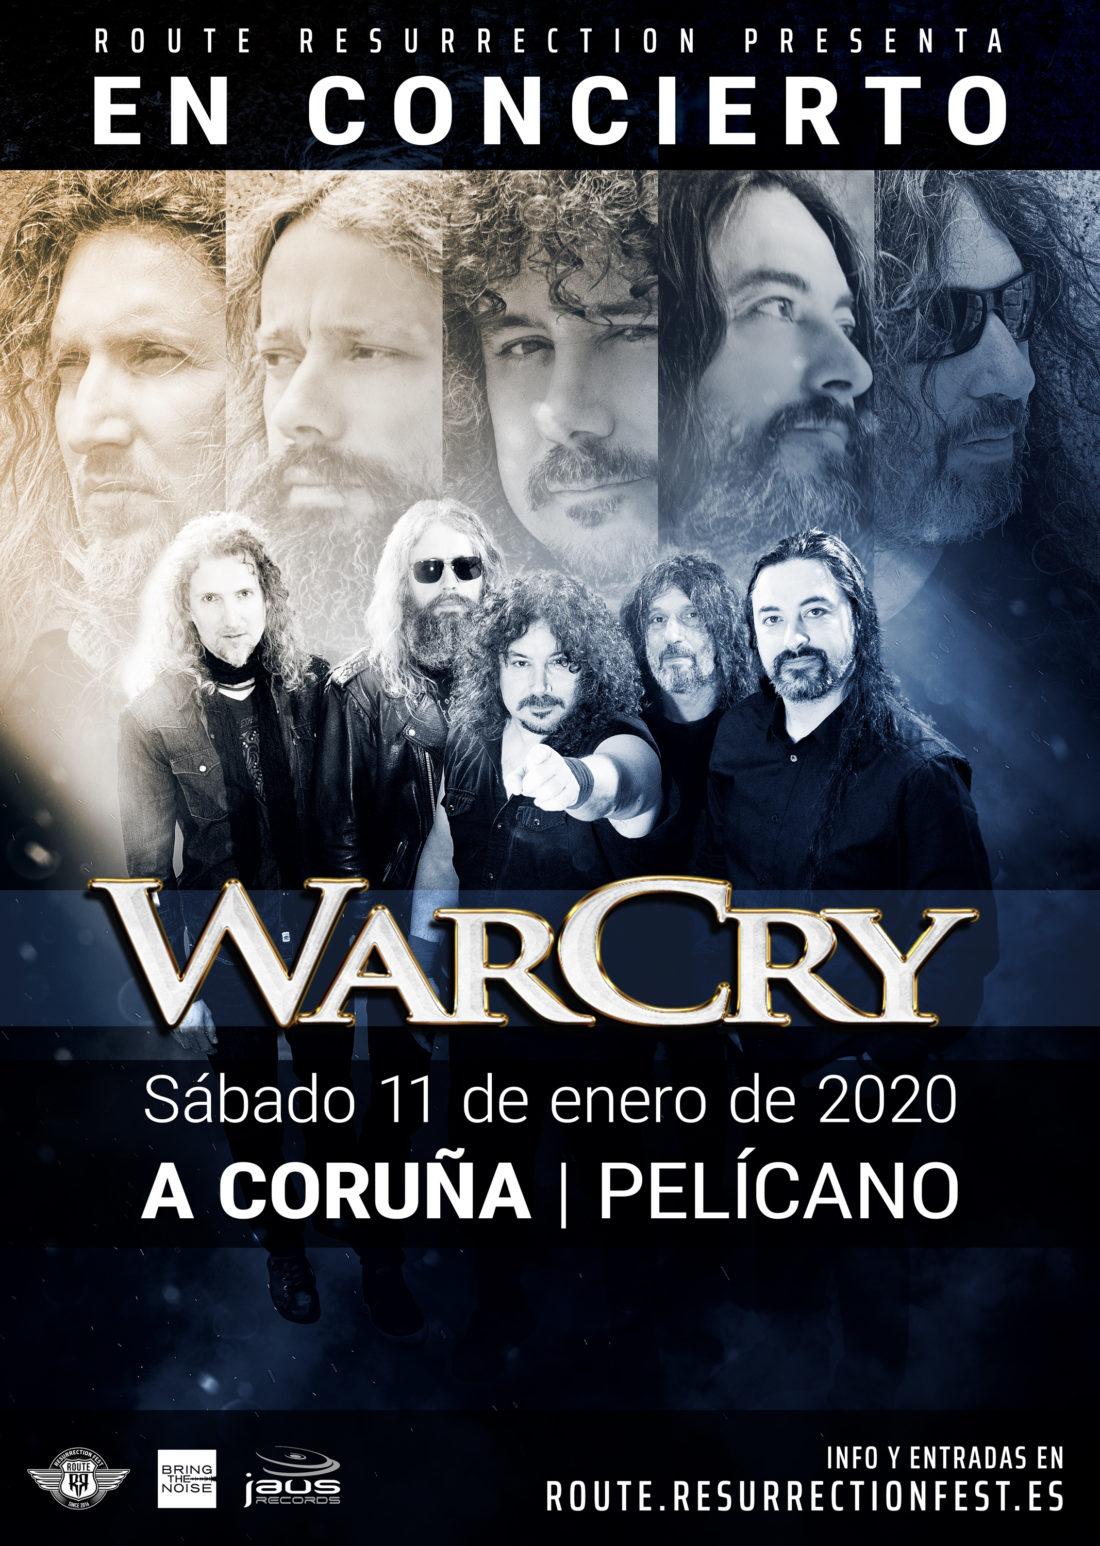 WarCry – A Coruña